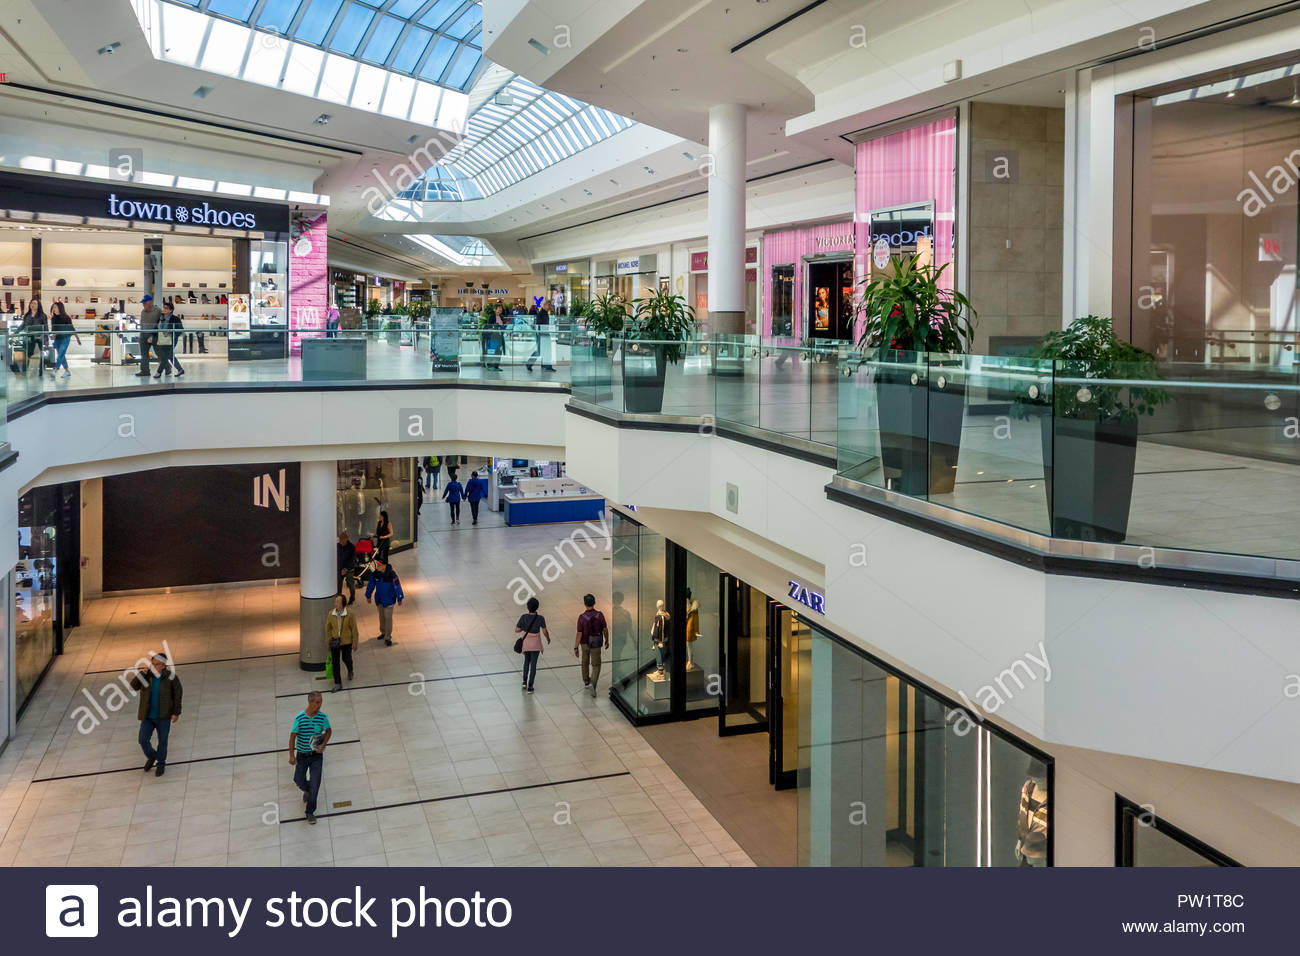 Fairview Mall High Resolution Stock